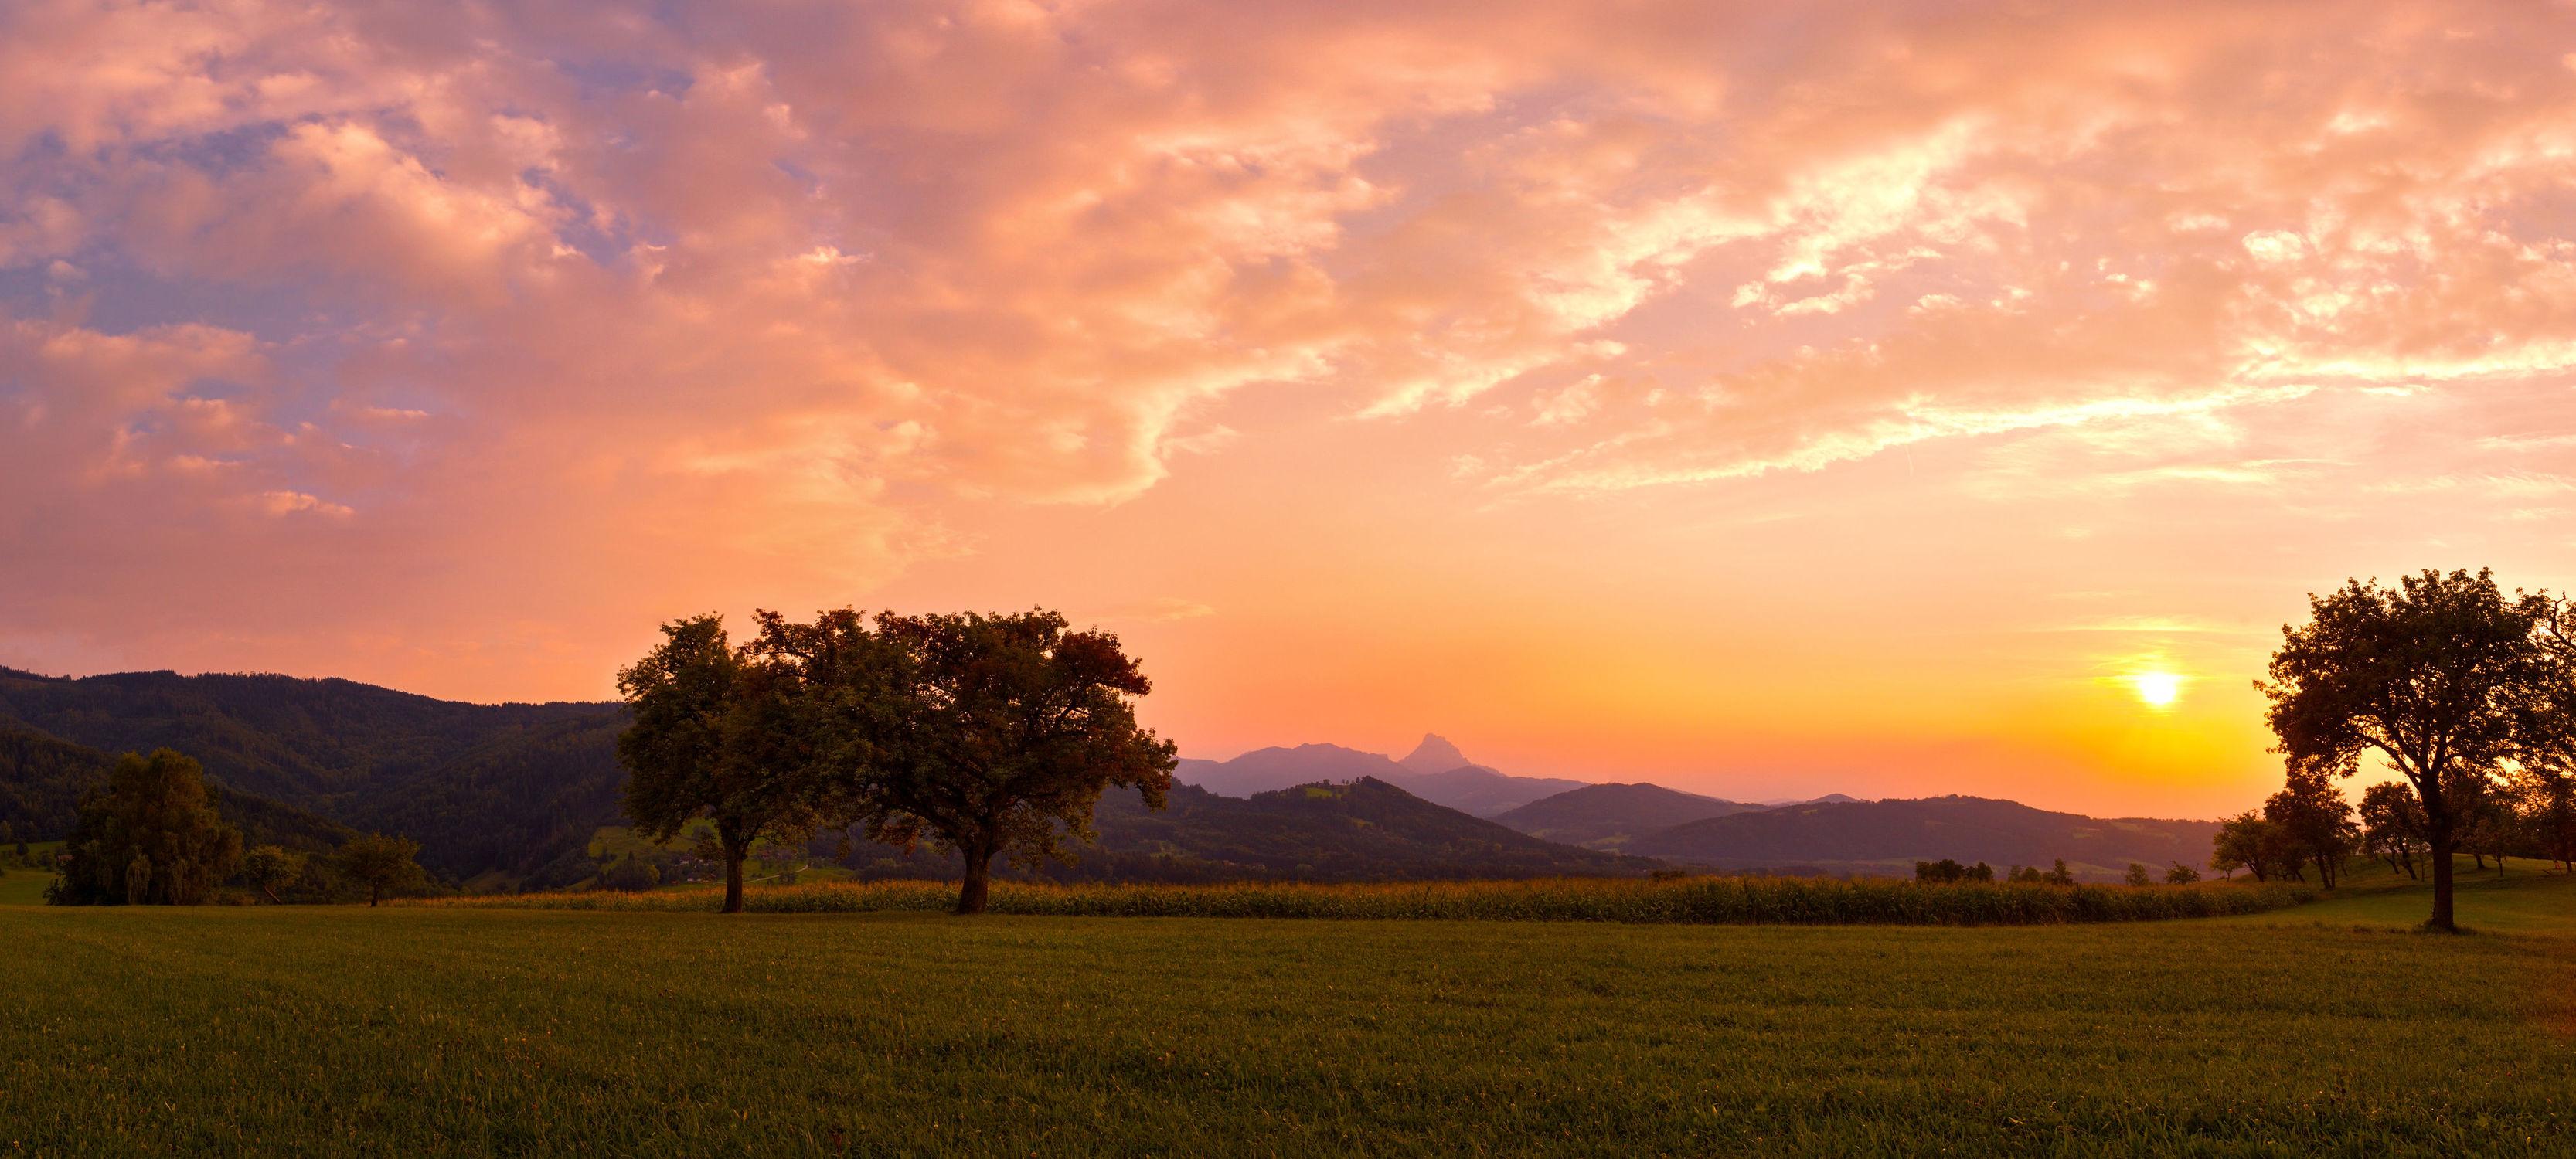 Bild mit Natur, Landschaften, Bäume, Sonnenuntergang, Sonnenaufgang, Österreich, Baum, Landschaft, Nature, Wiese, Wiesen, Weide, Weiden